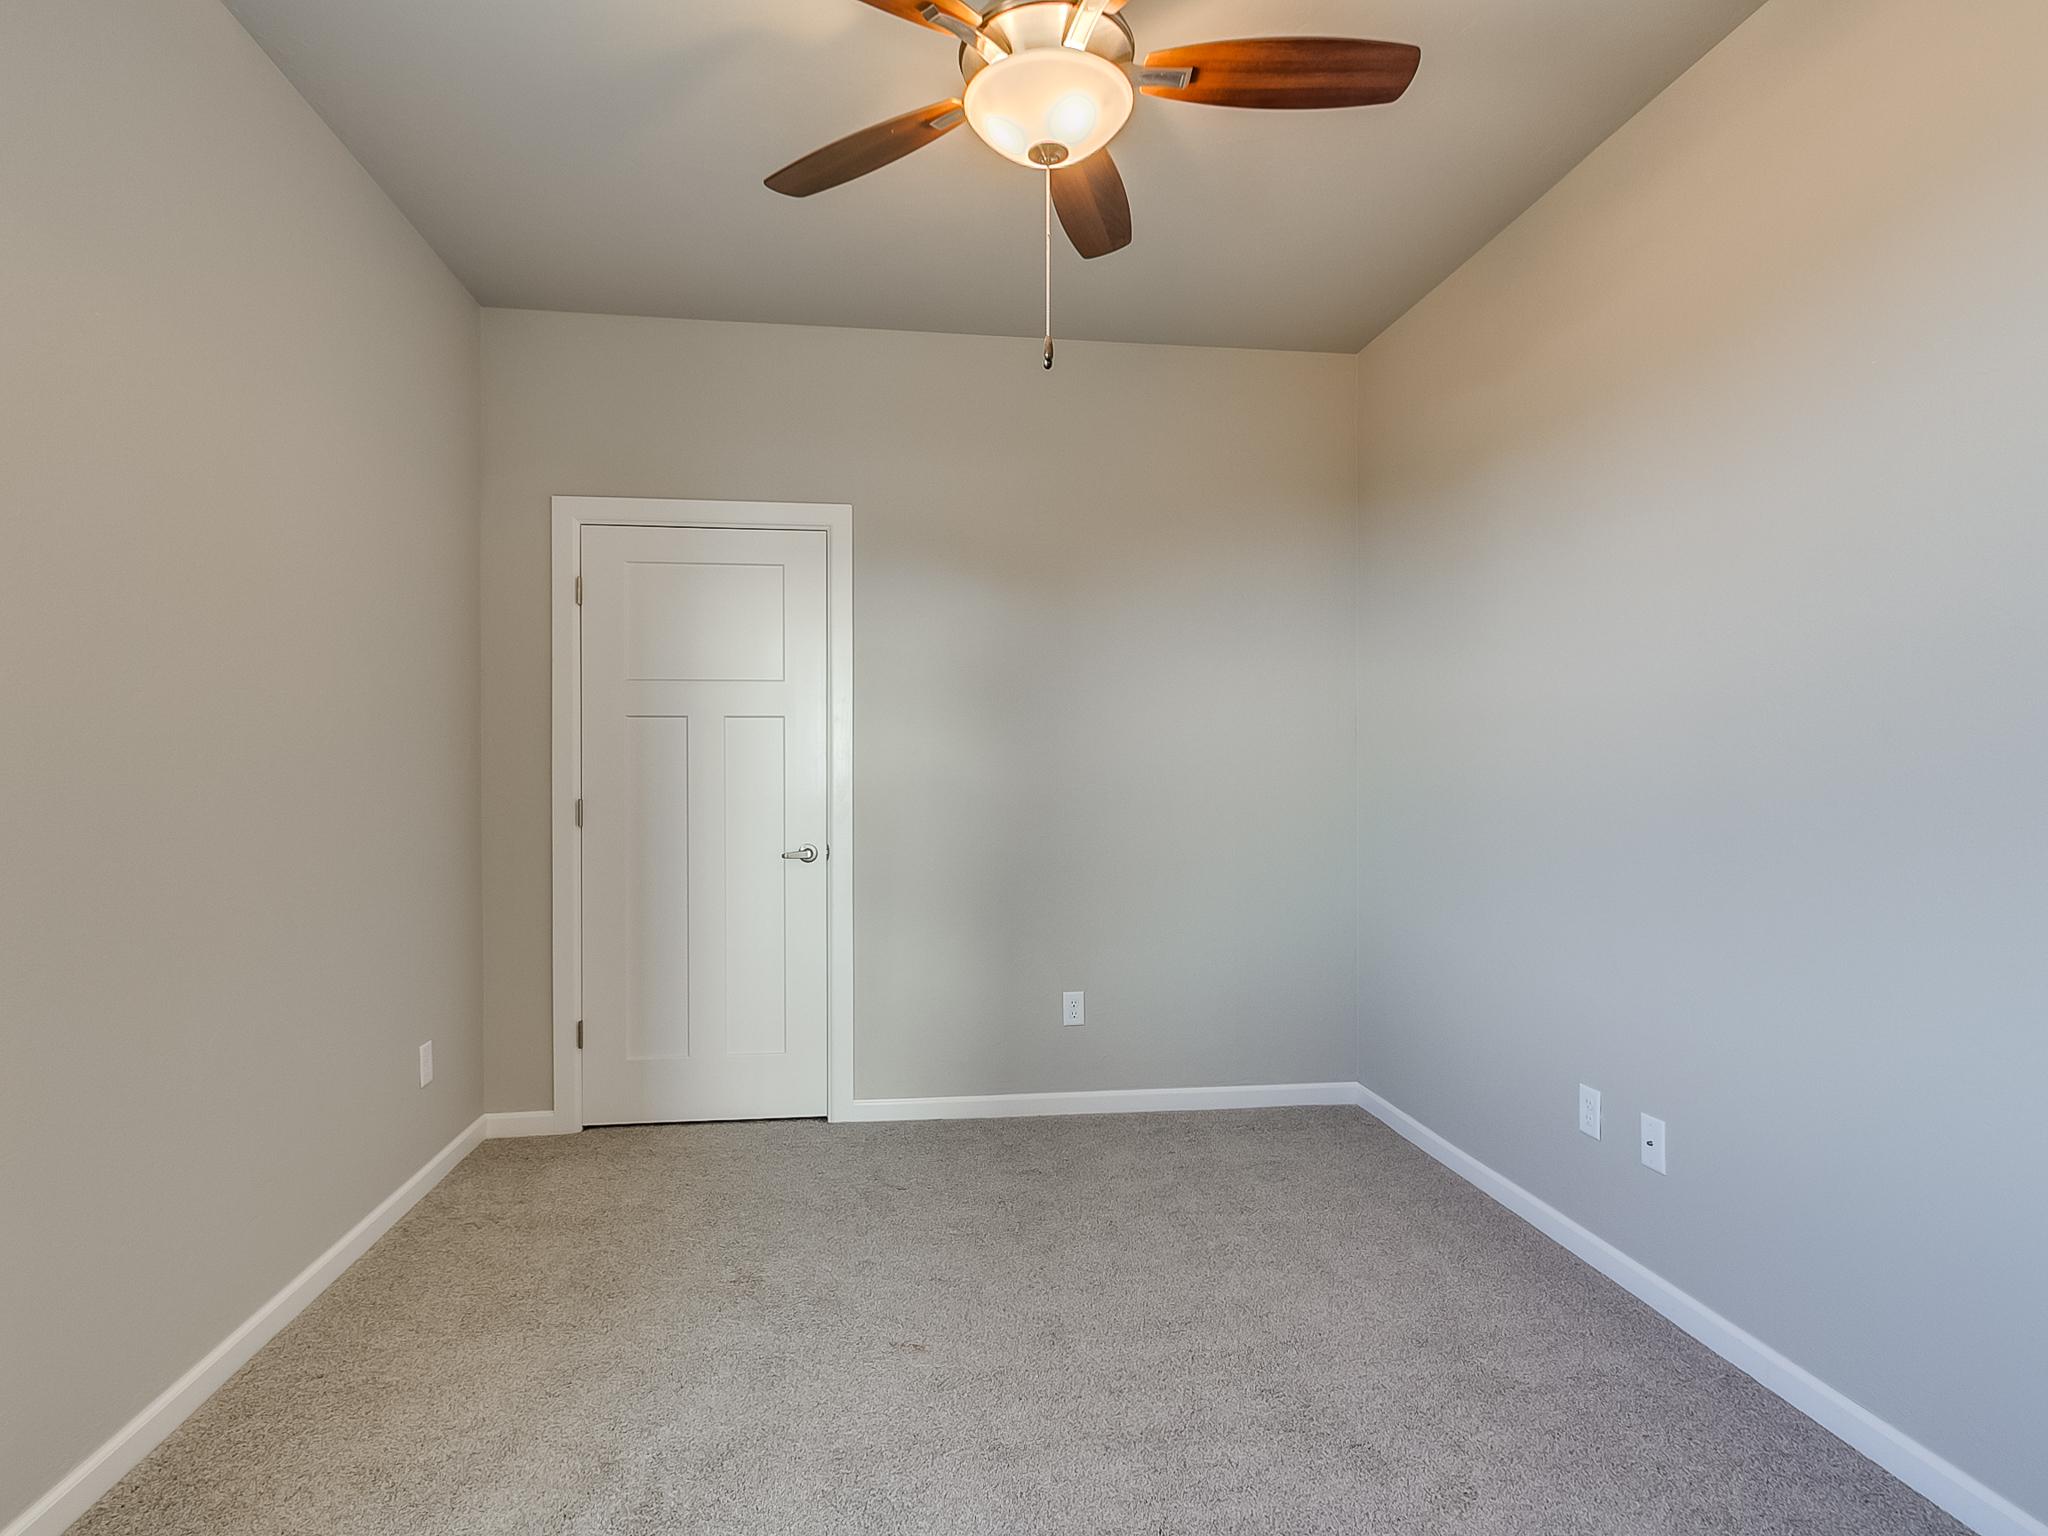 28 - Bedroom.jpg